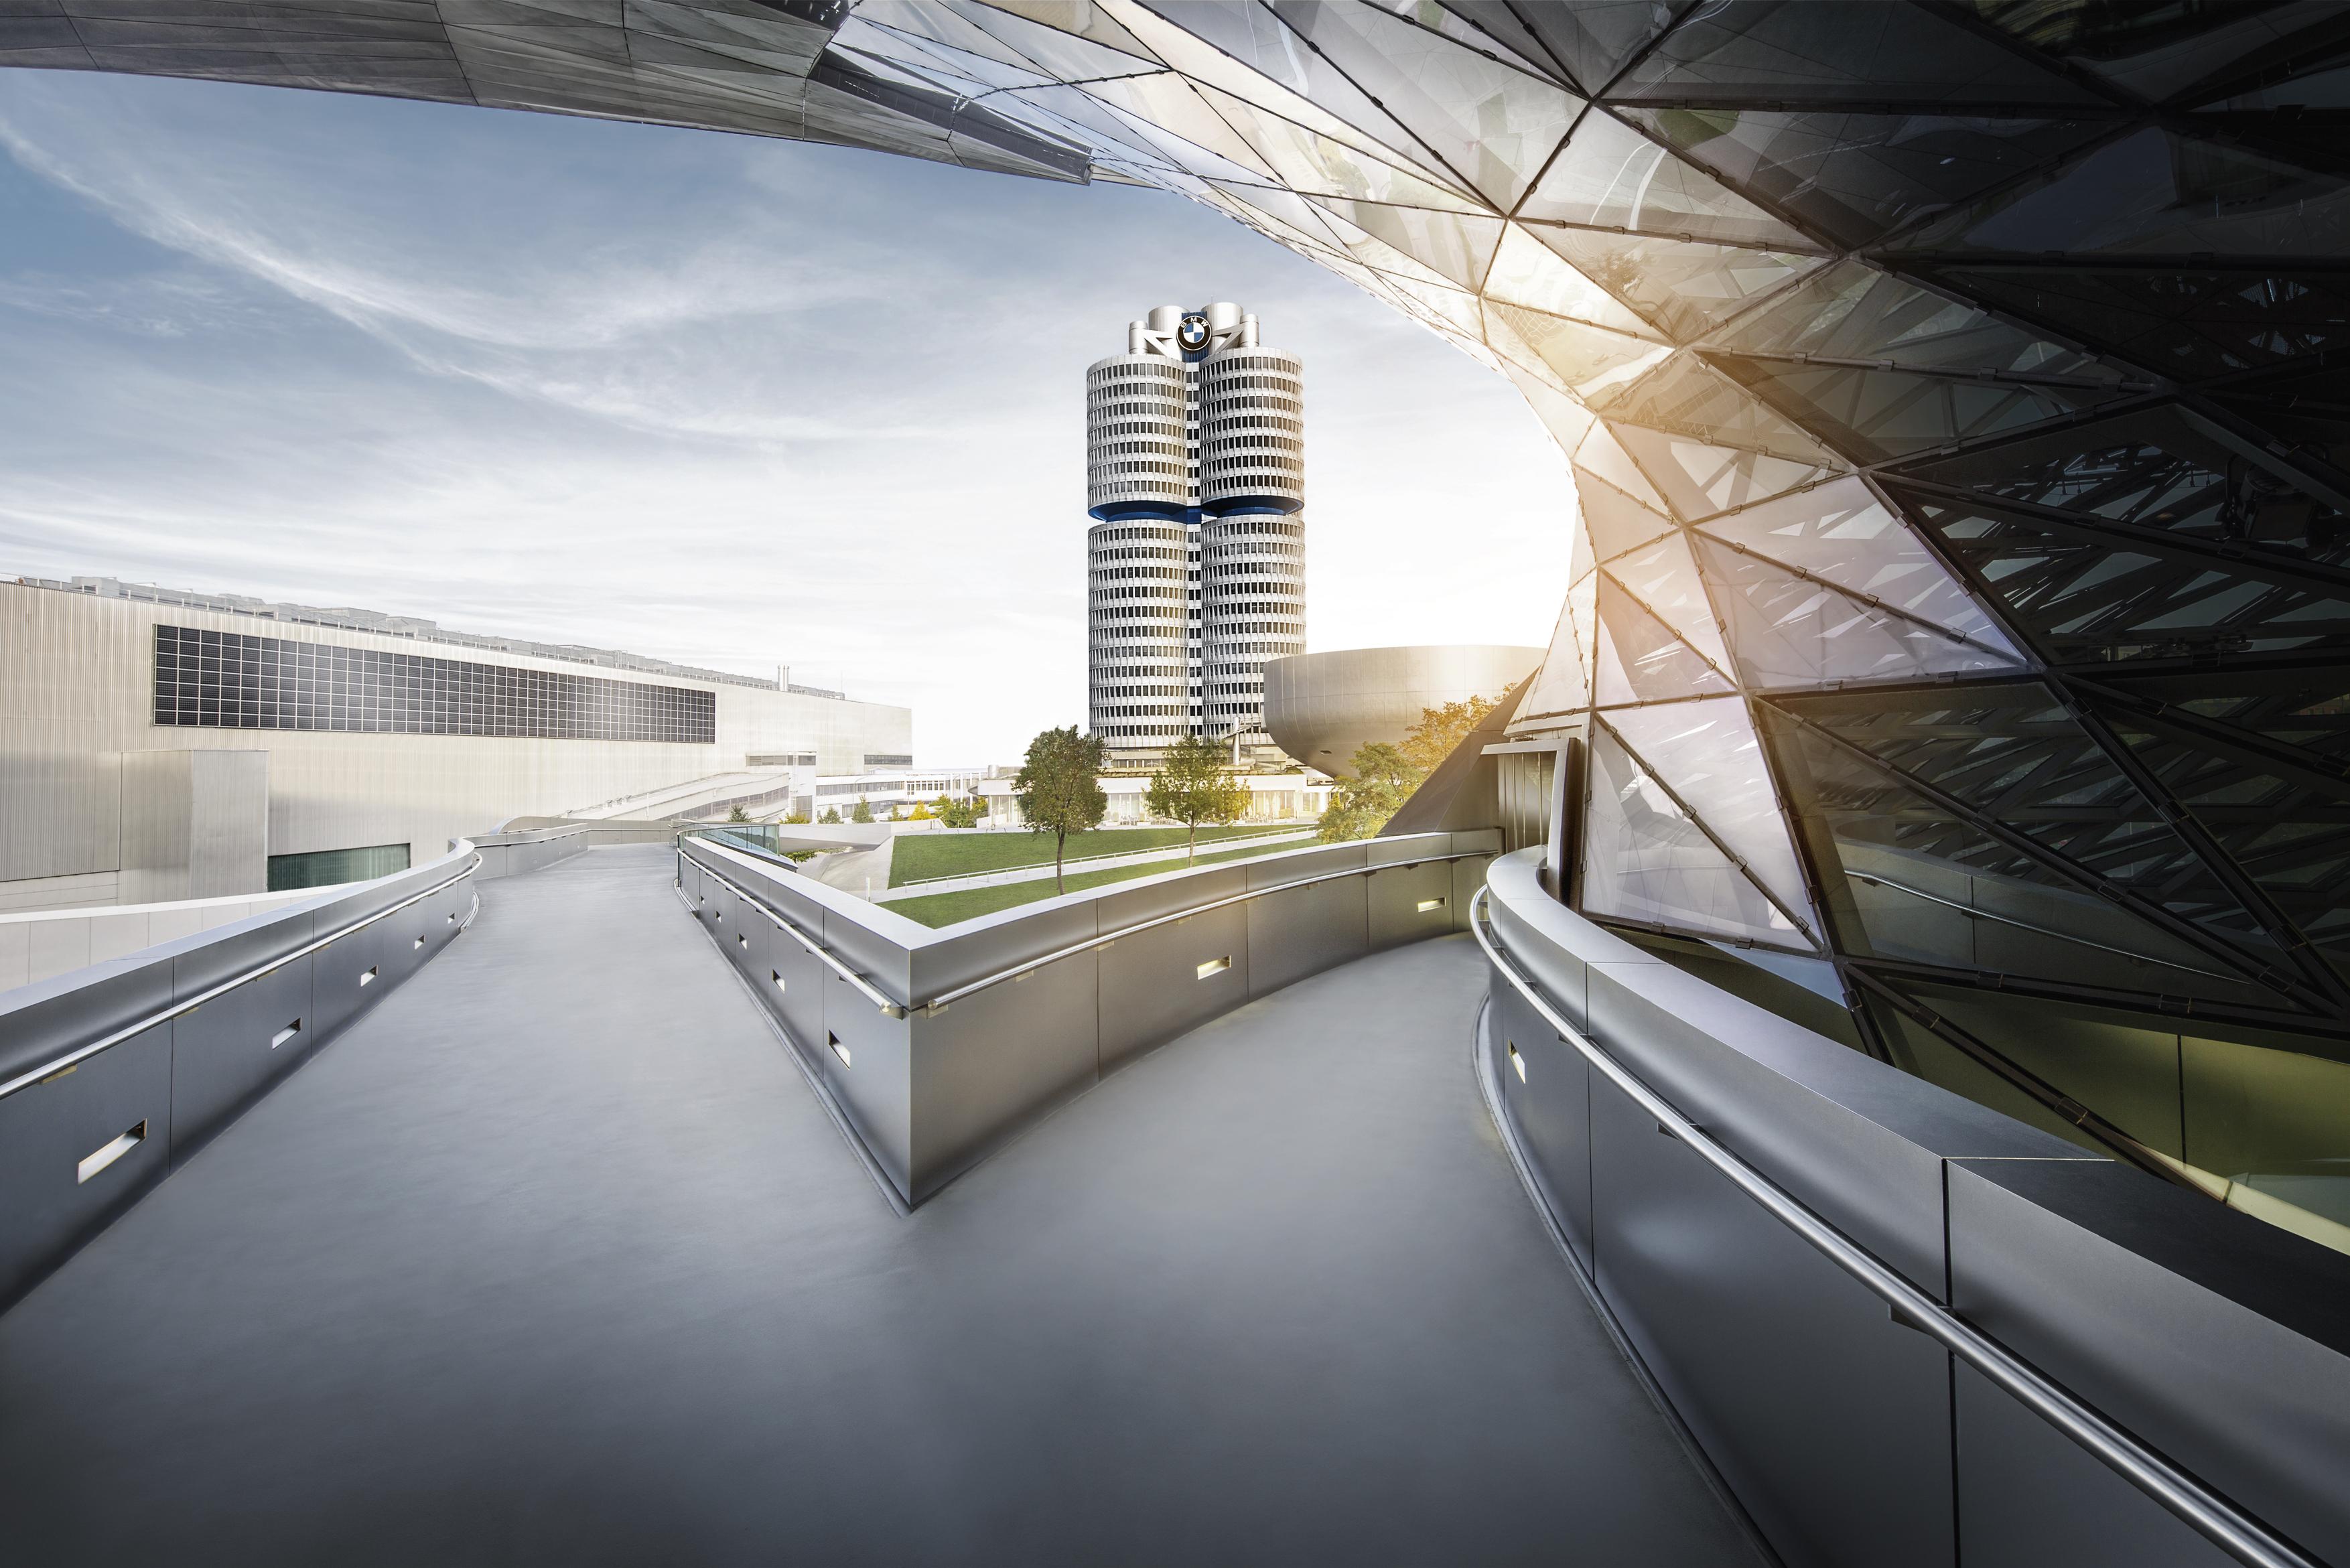 BMW's iconic headquarters tower.